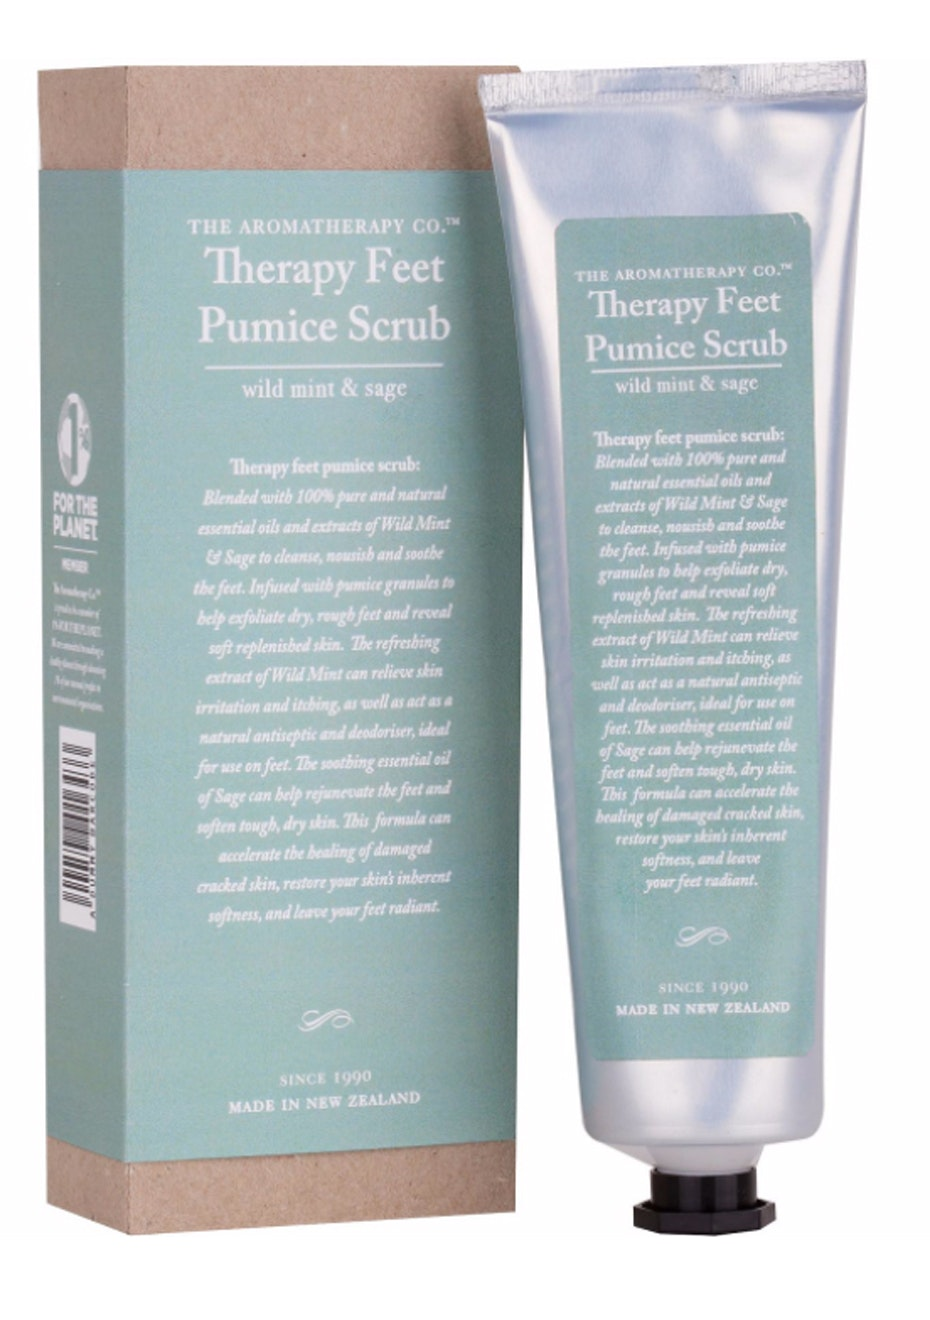 The Aromatherapy Co. Therapy Feet Pumice Scrub - Wild Mint & Sage - 130ml